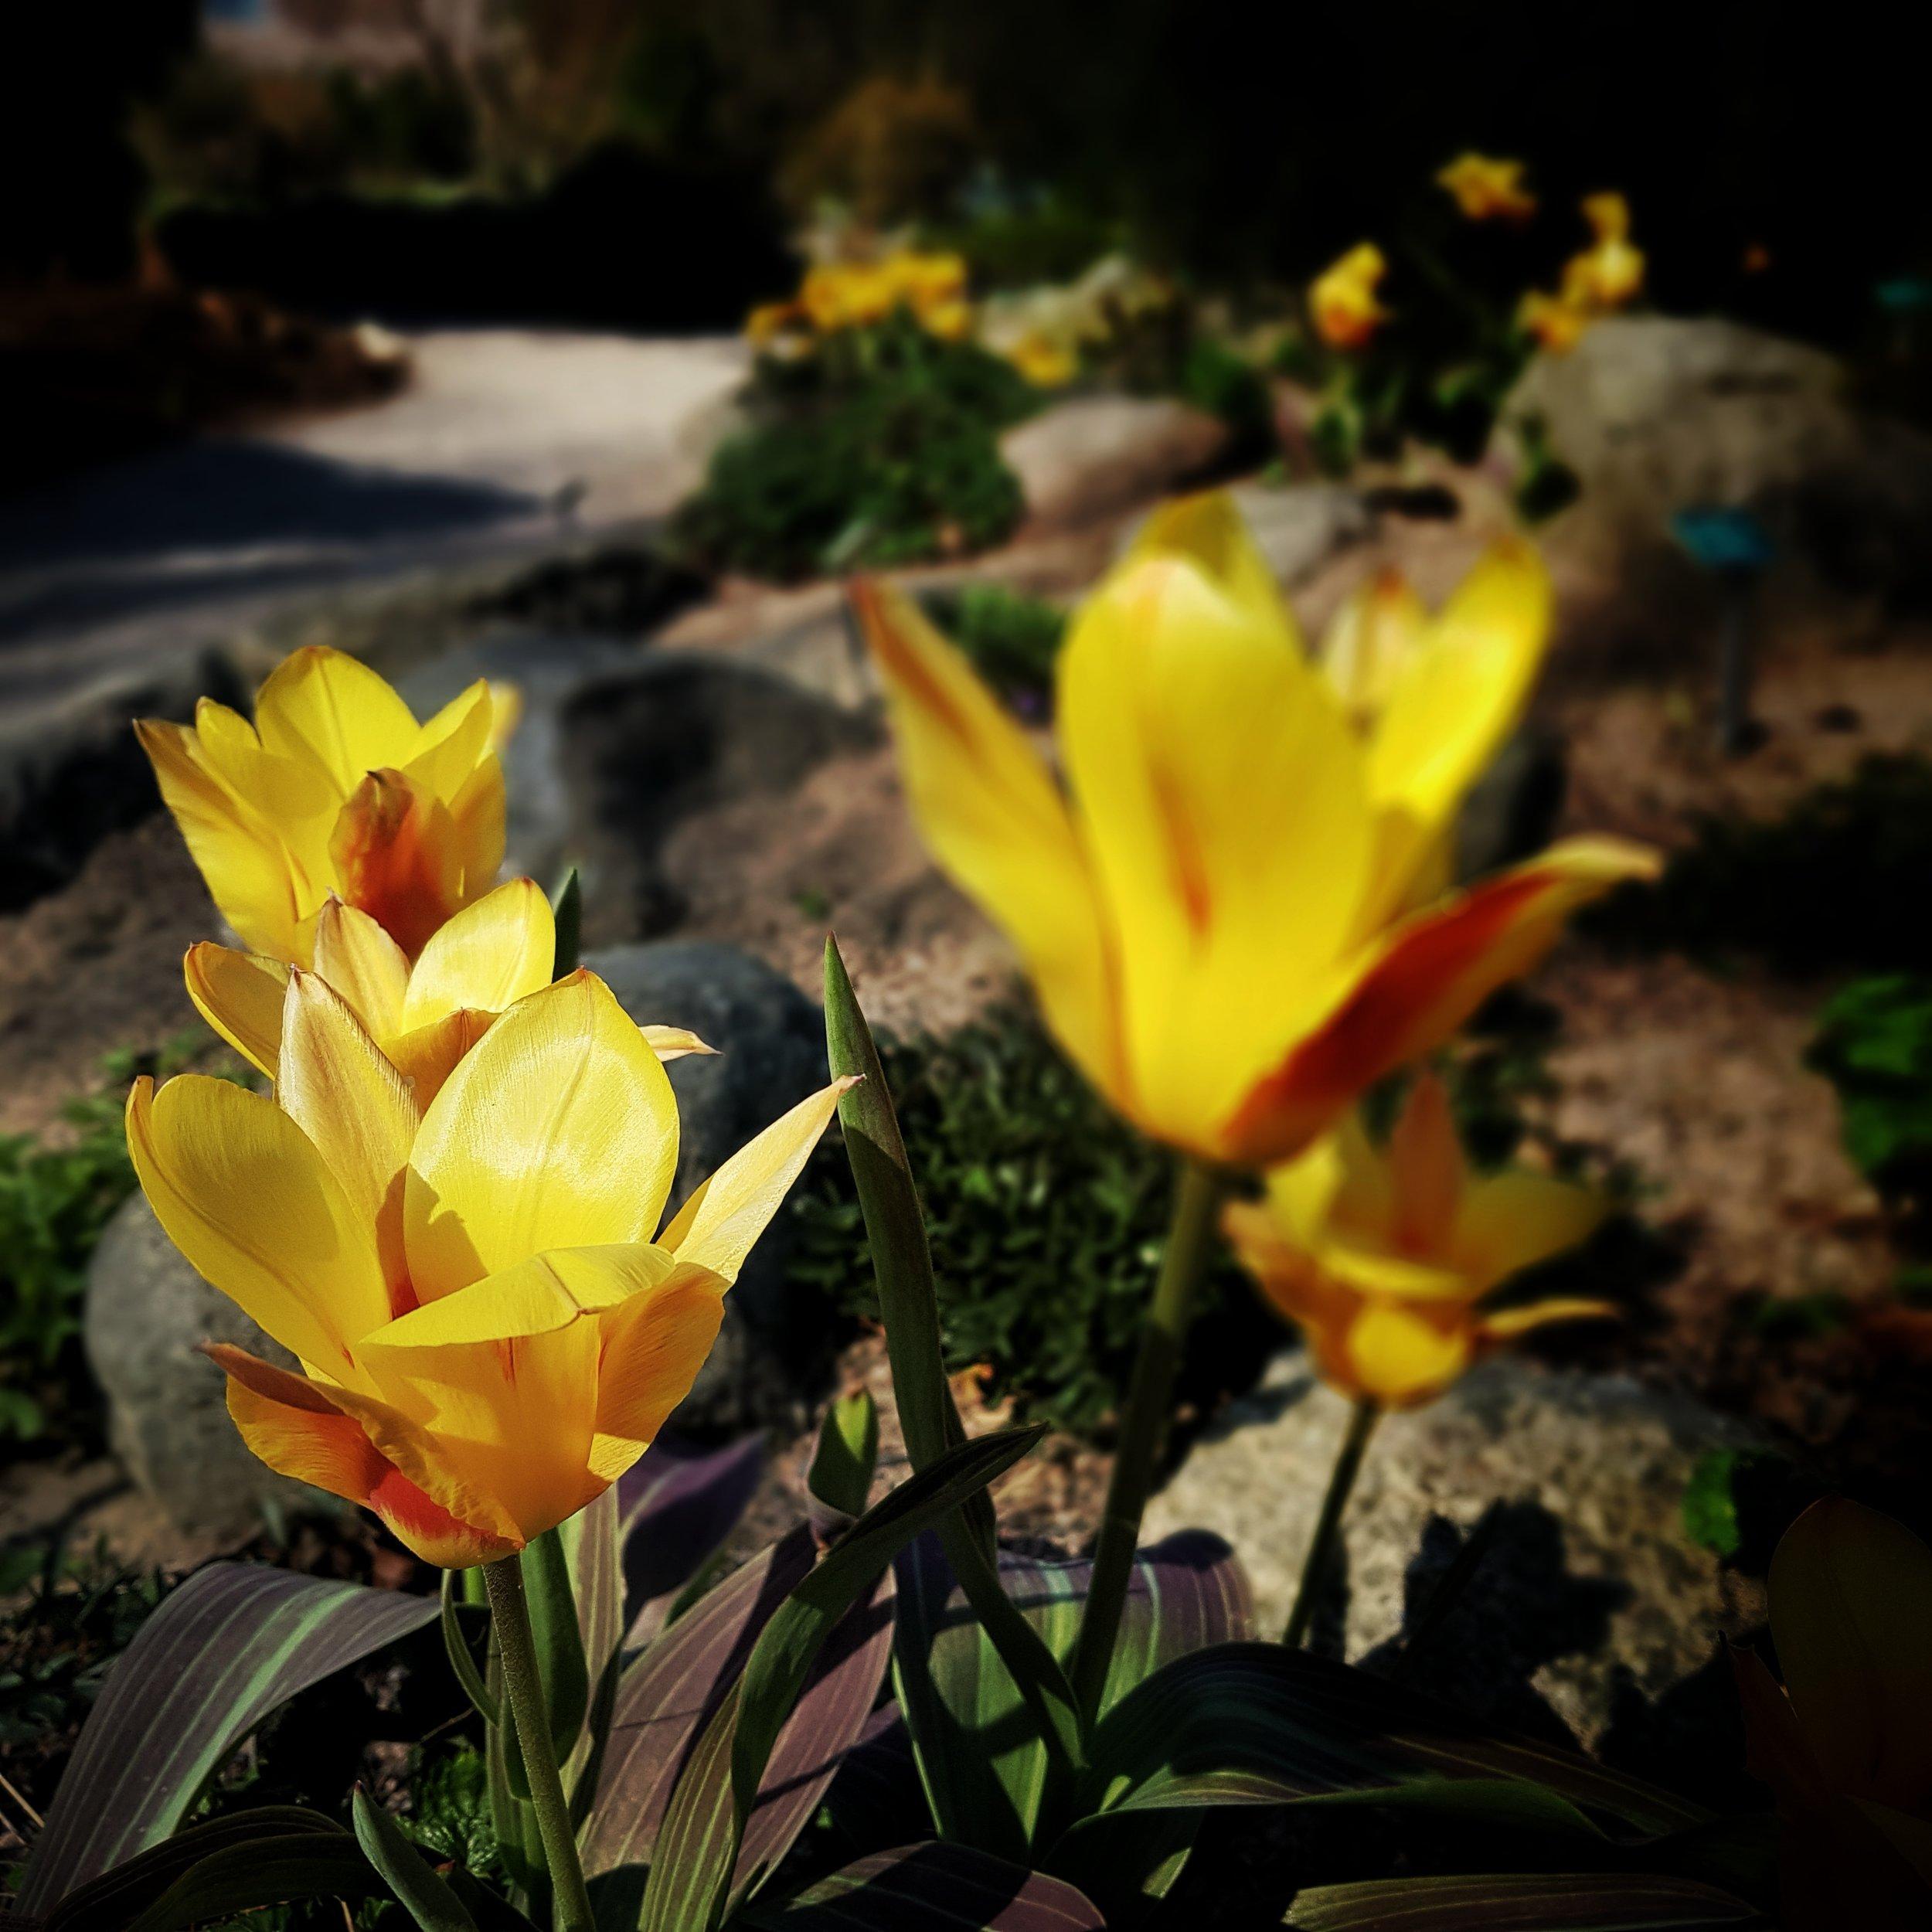 Day 114 - April 24: Yellow Petals